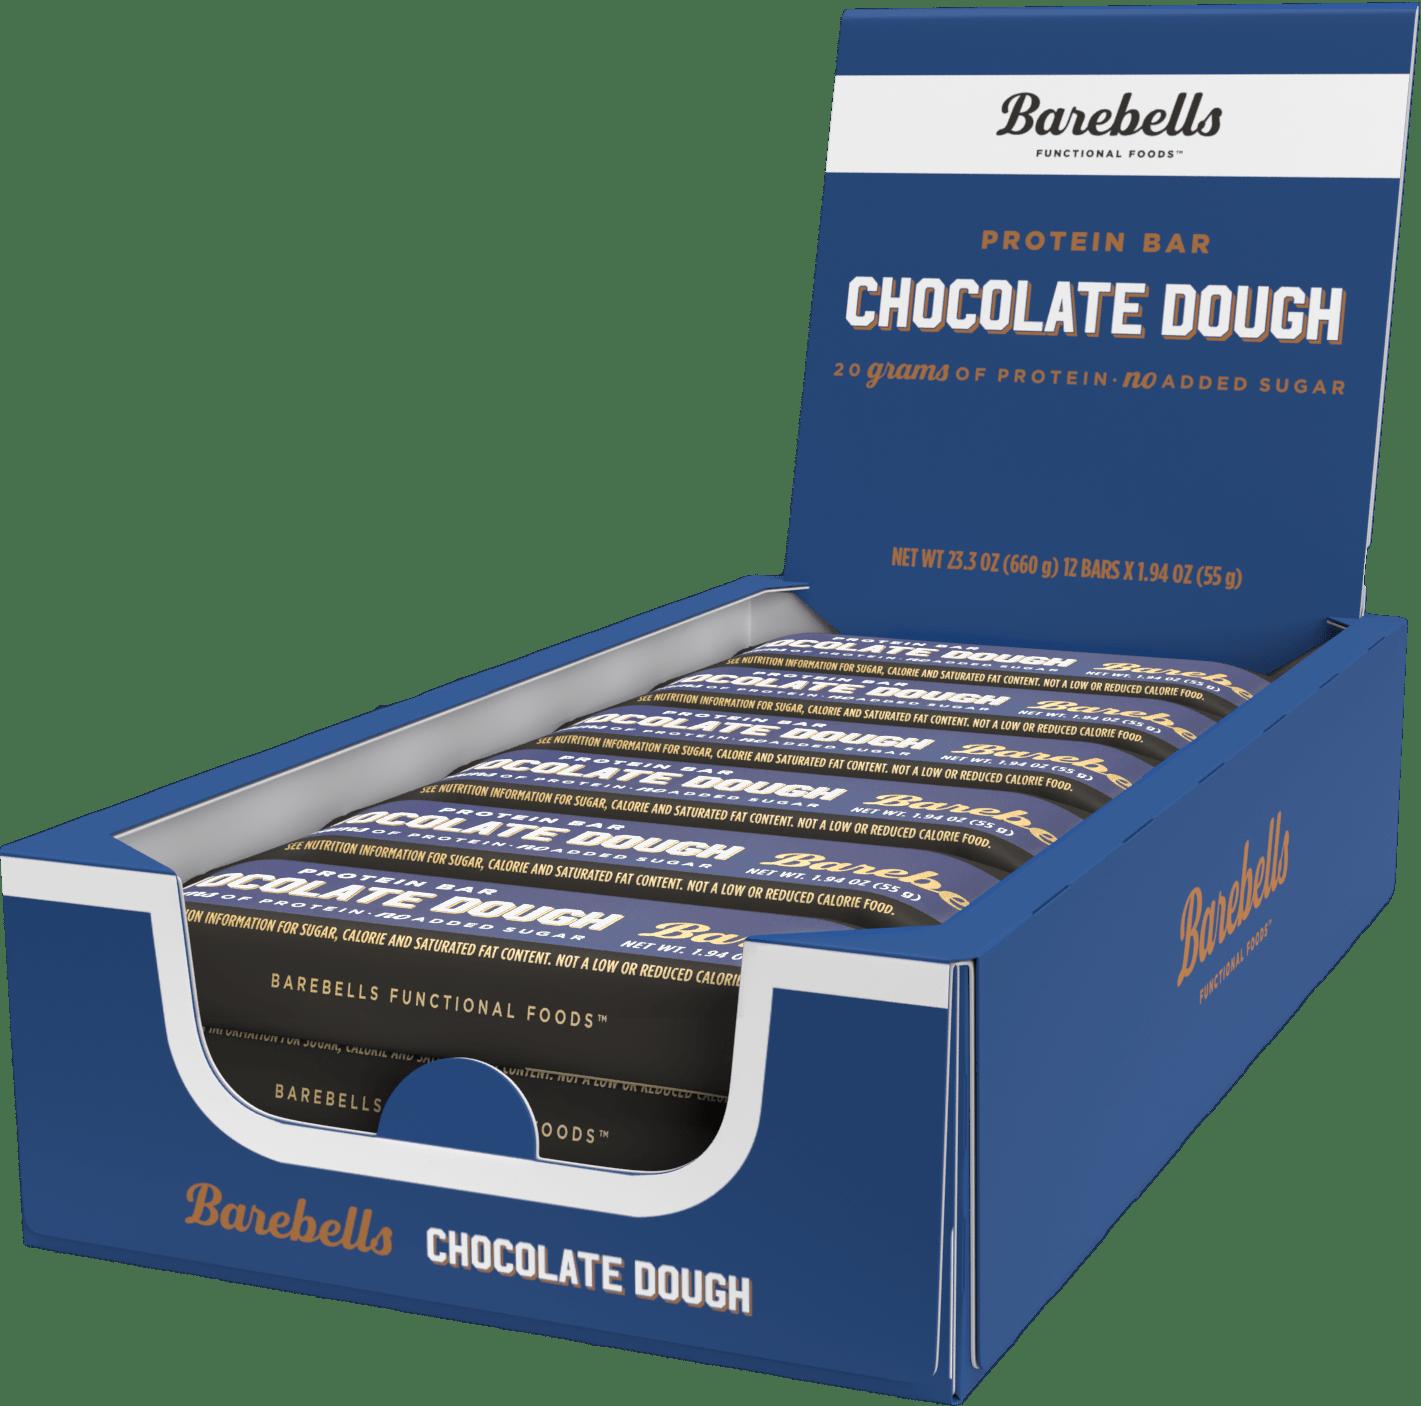 Barebells Chocolate Dough